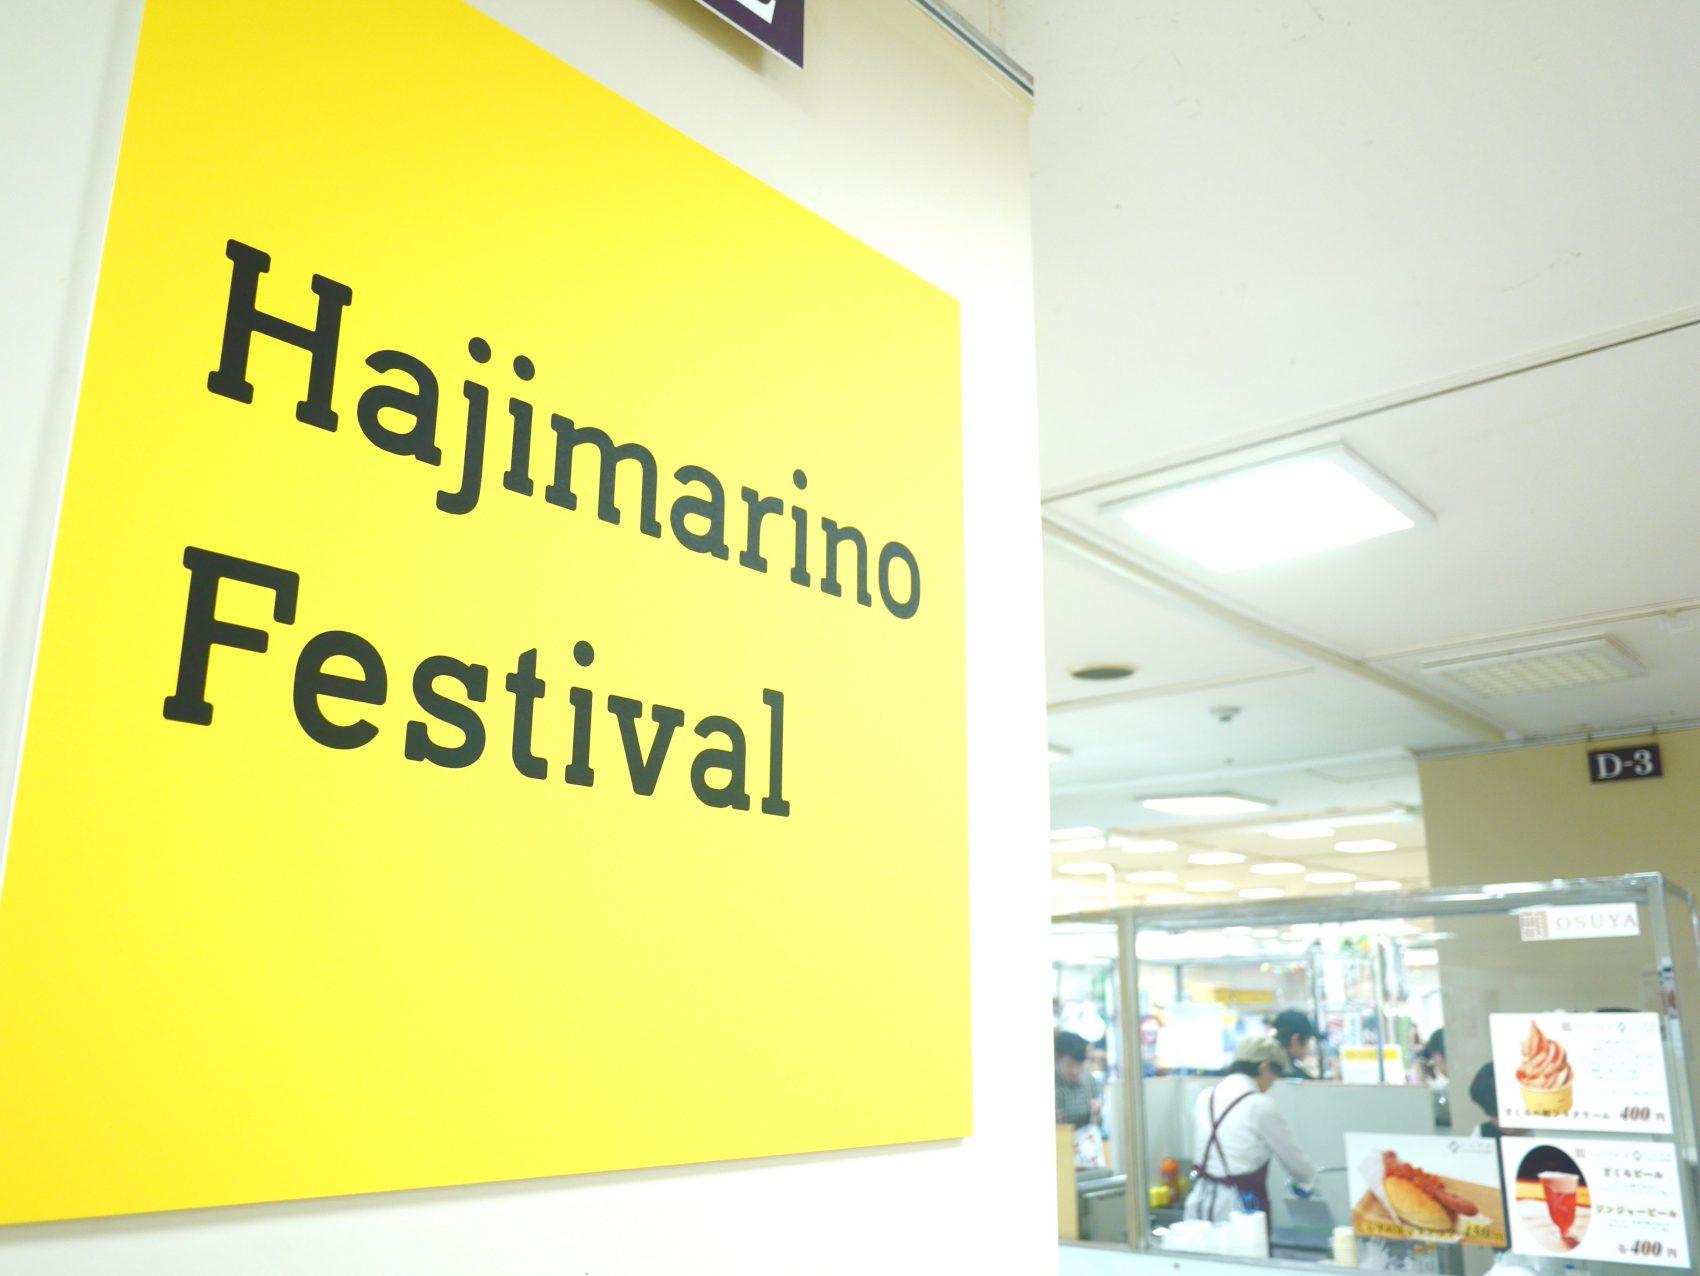 Hajimarino Festival 看板